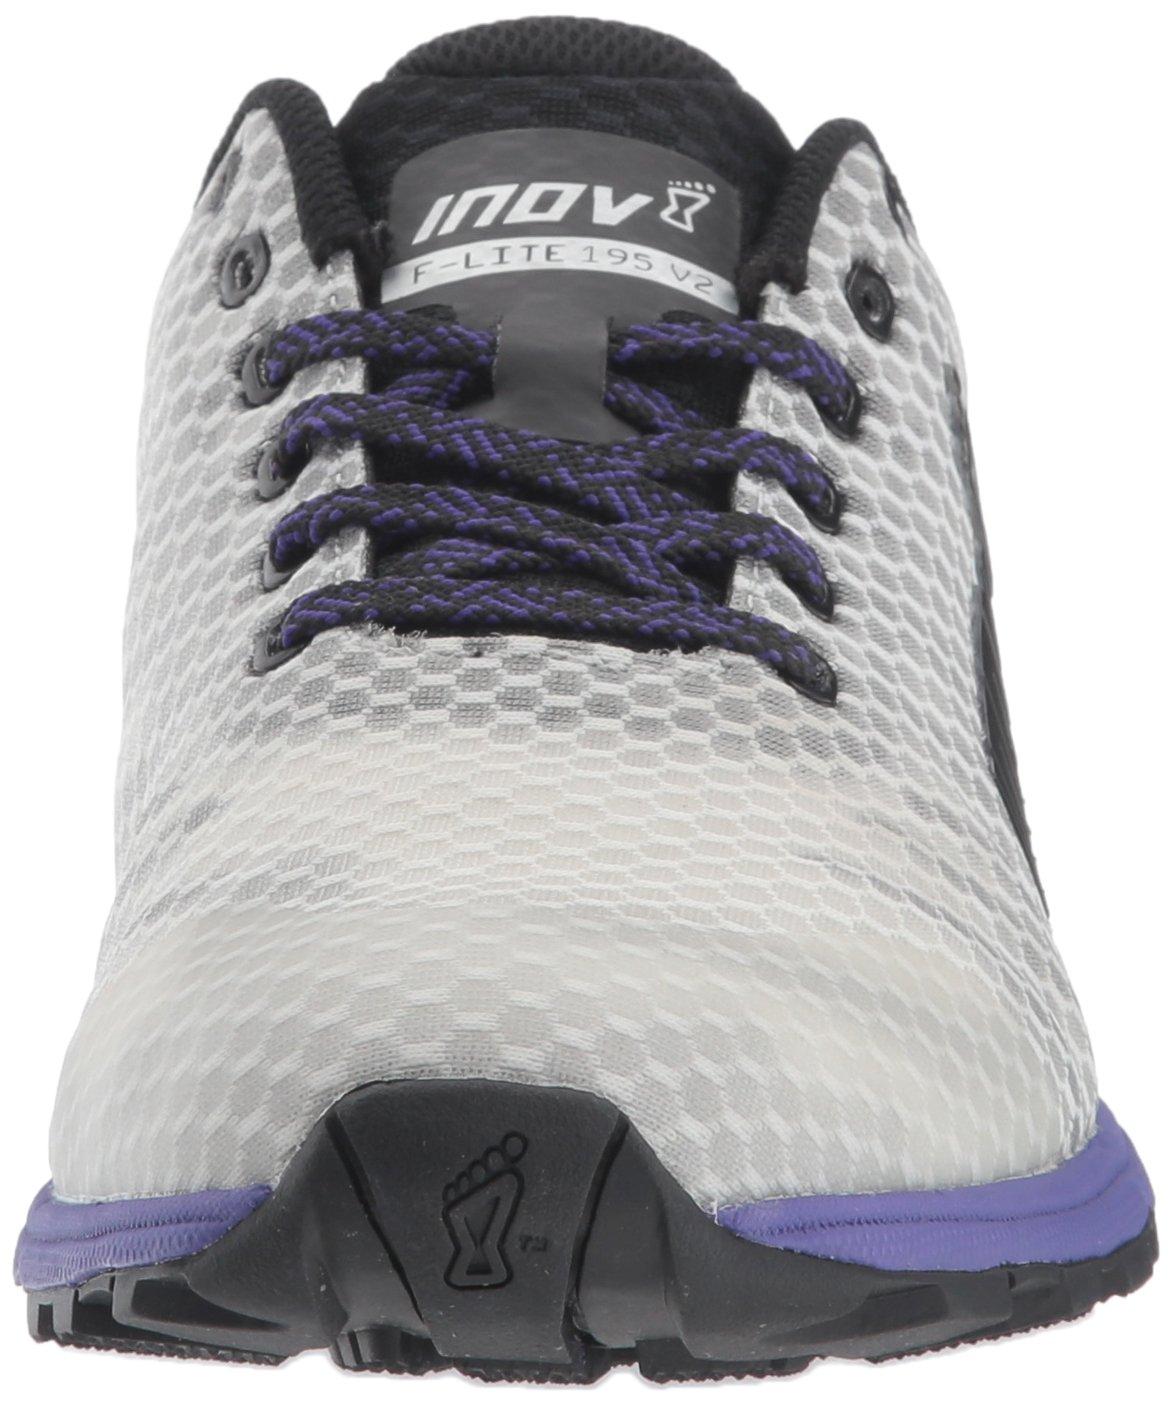 Inov-8 Women's F-Lite 7 195 V2 (W) Cross Trainer B073VSMNHC 7 F-Lite N US|Grey/Purple 87180a